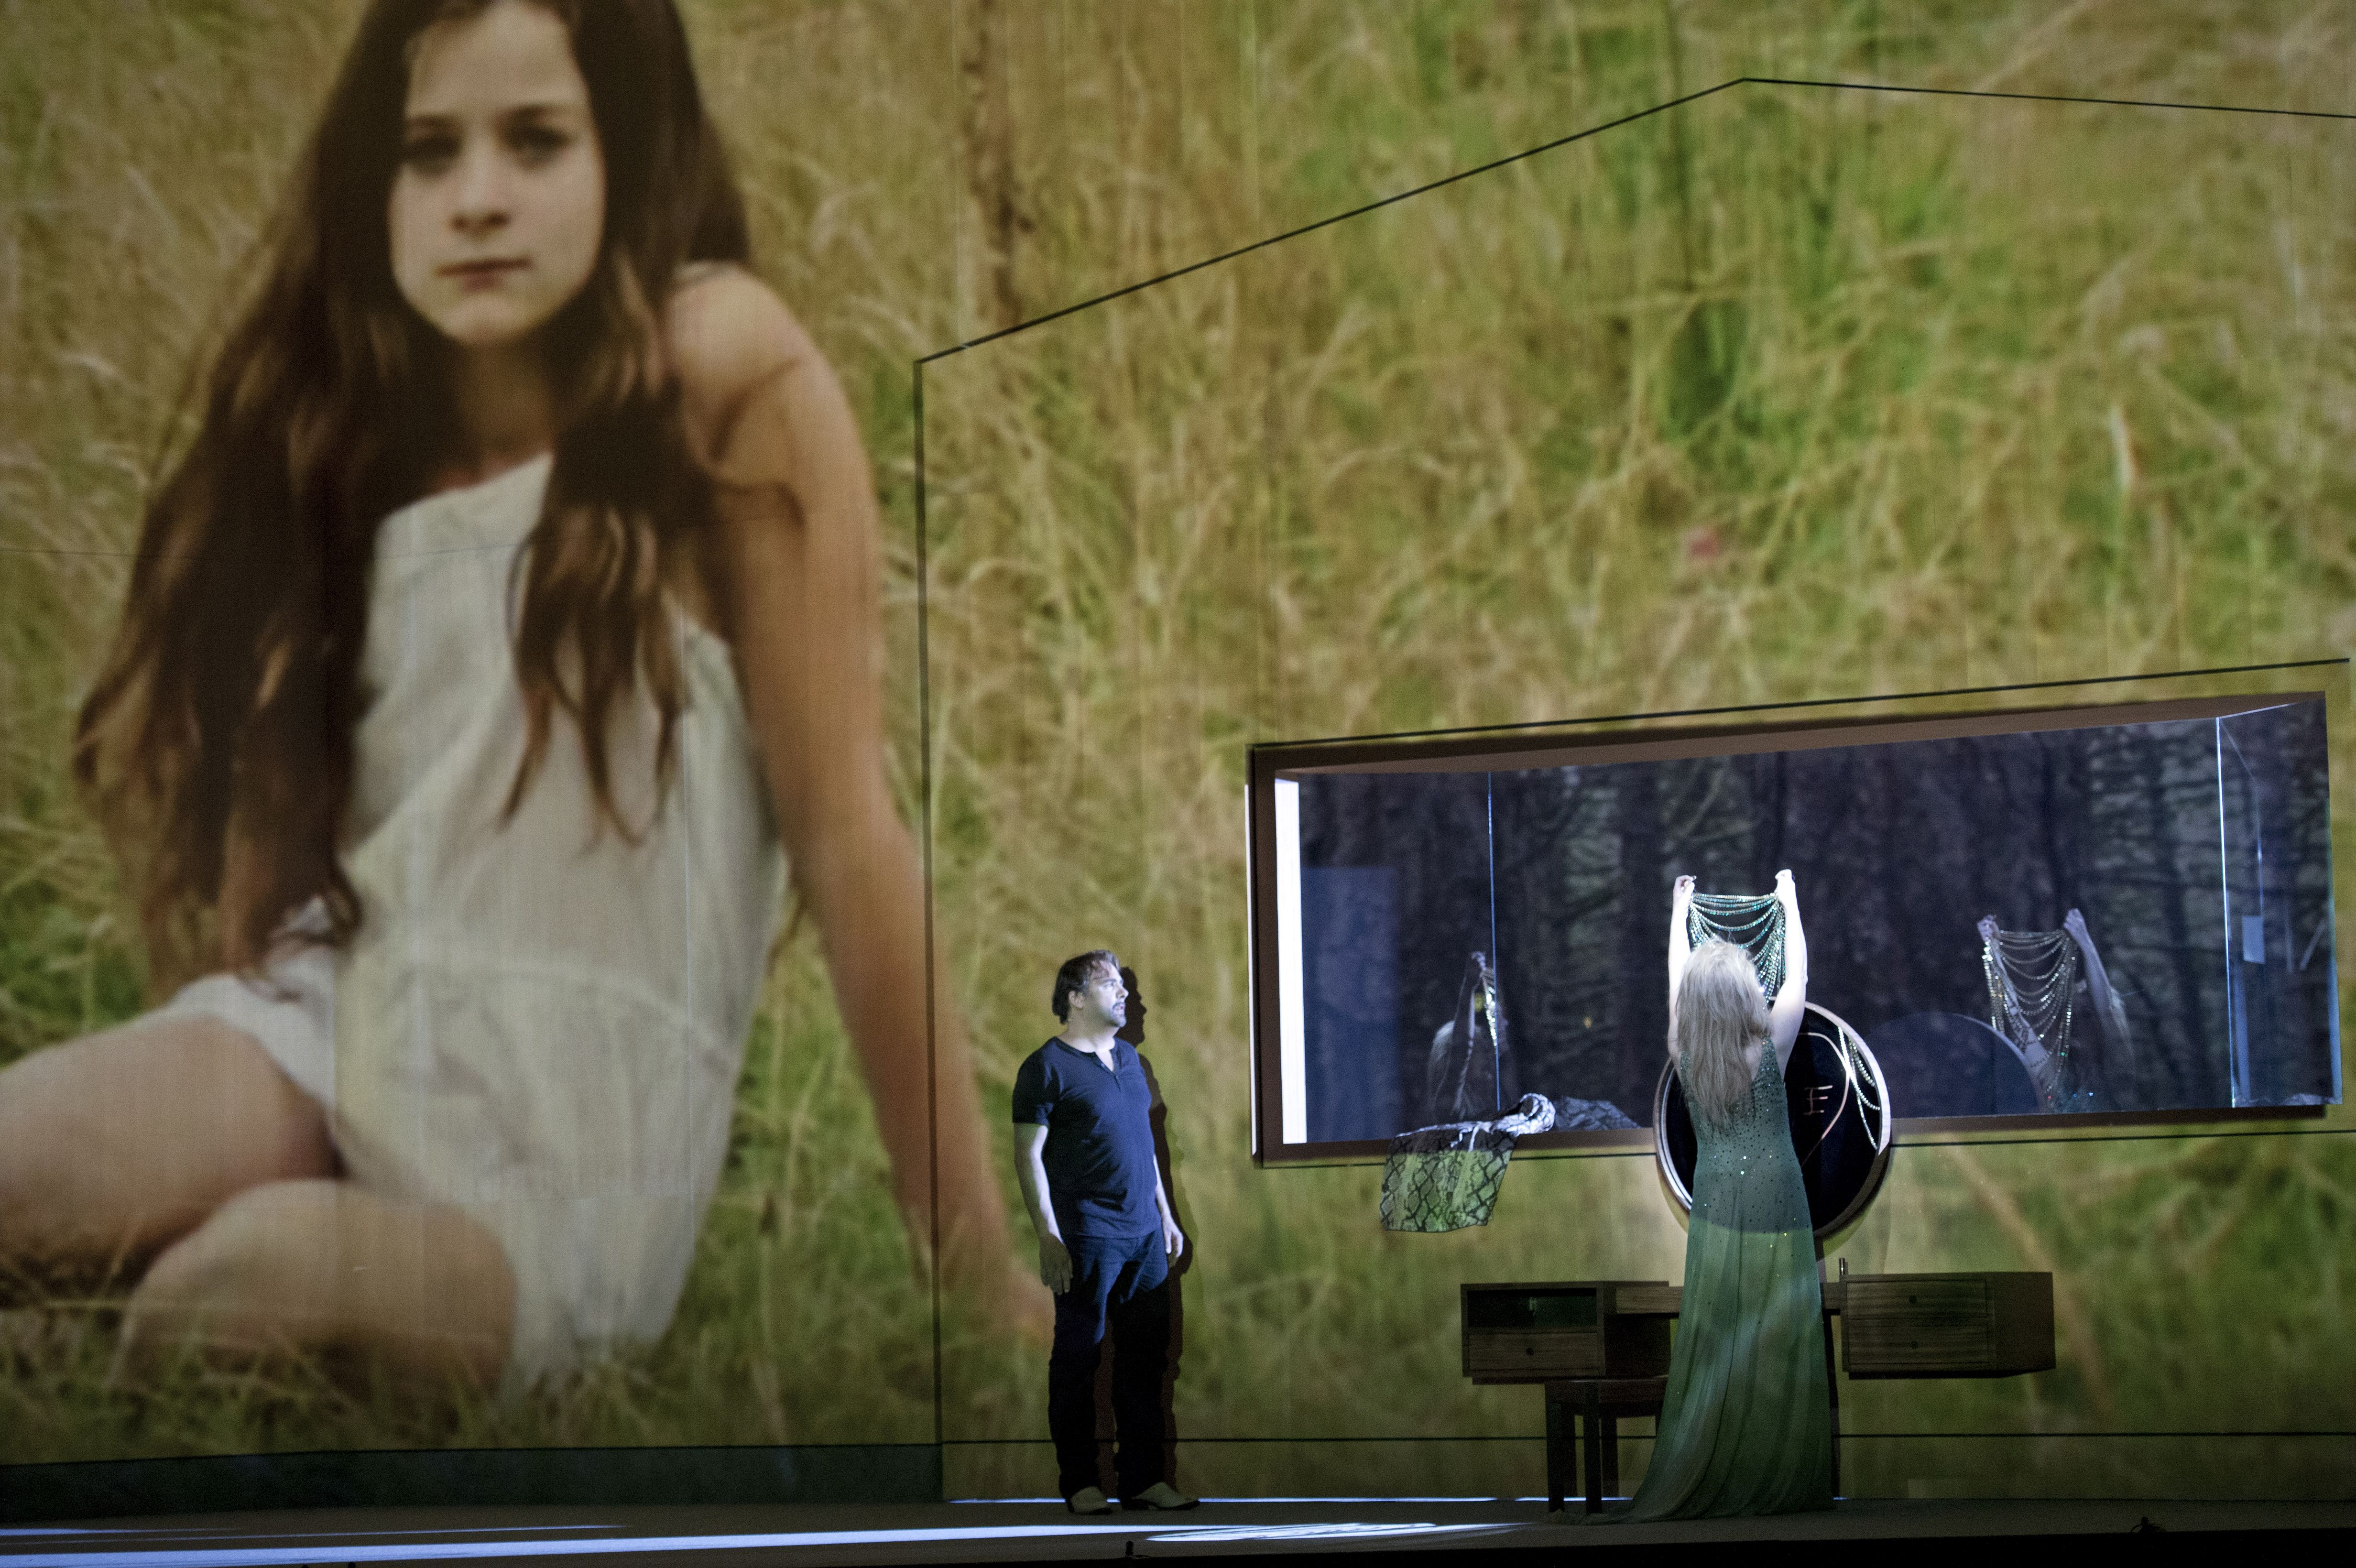 Marc Albrecht (conductor), Ivo van Hove (director), Jan Versweyveld (sets/lighting design), An D'Huys (costumes), Tal Yarden (video), Janine Brogt&Klaus Bertisch (dramaturge)